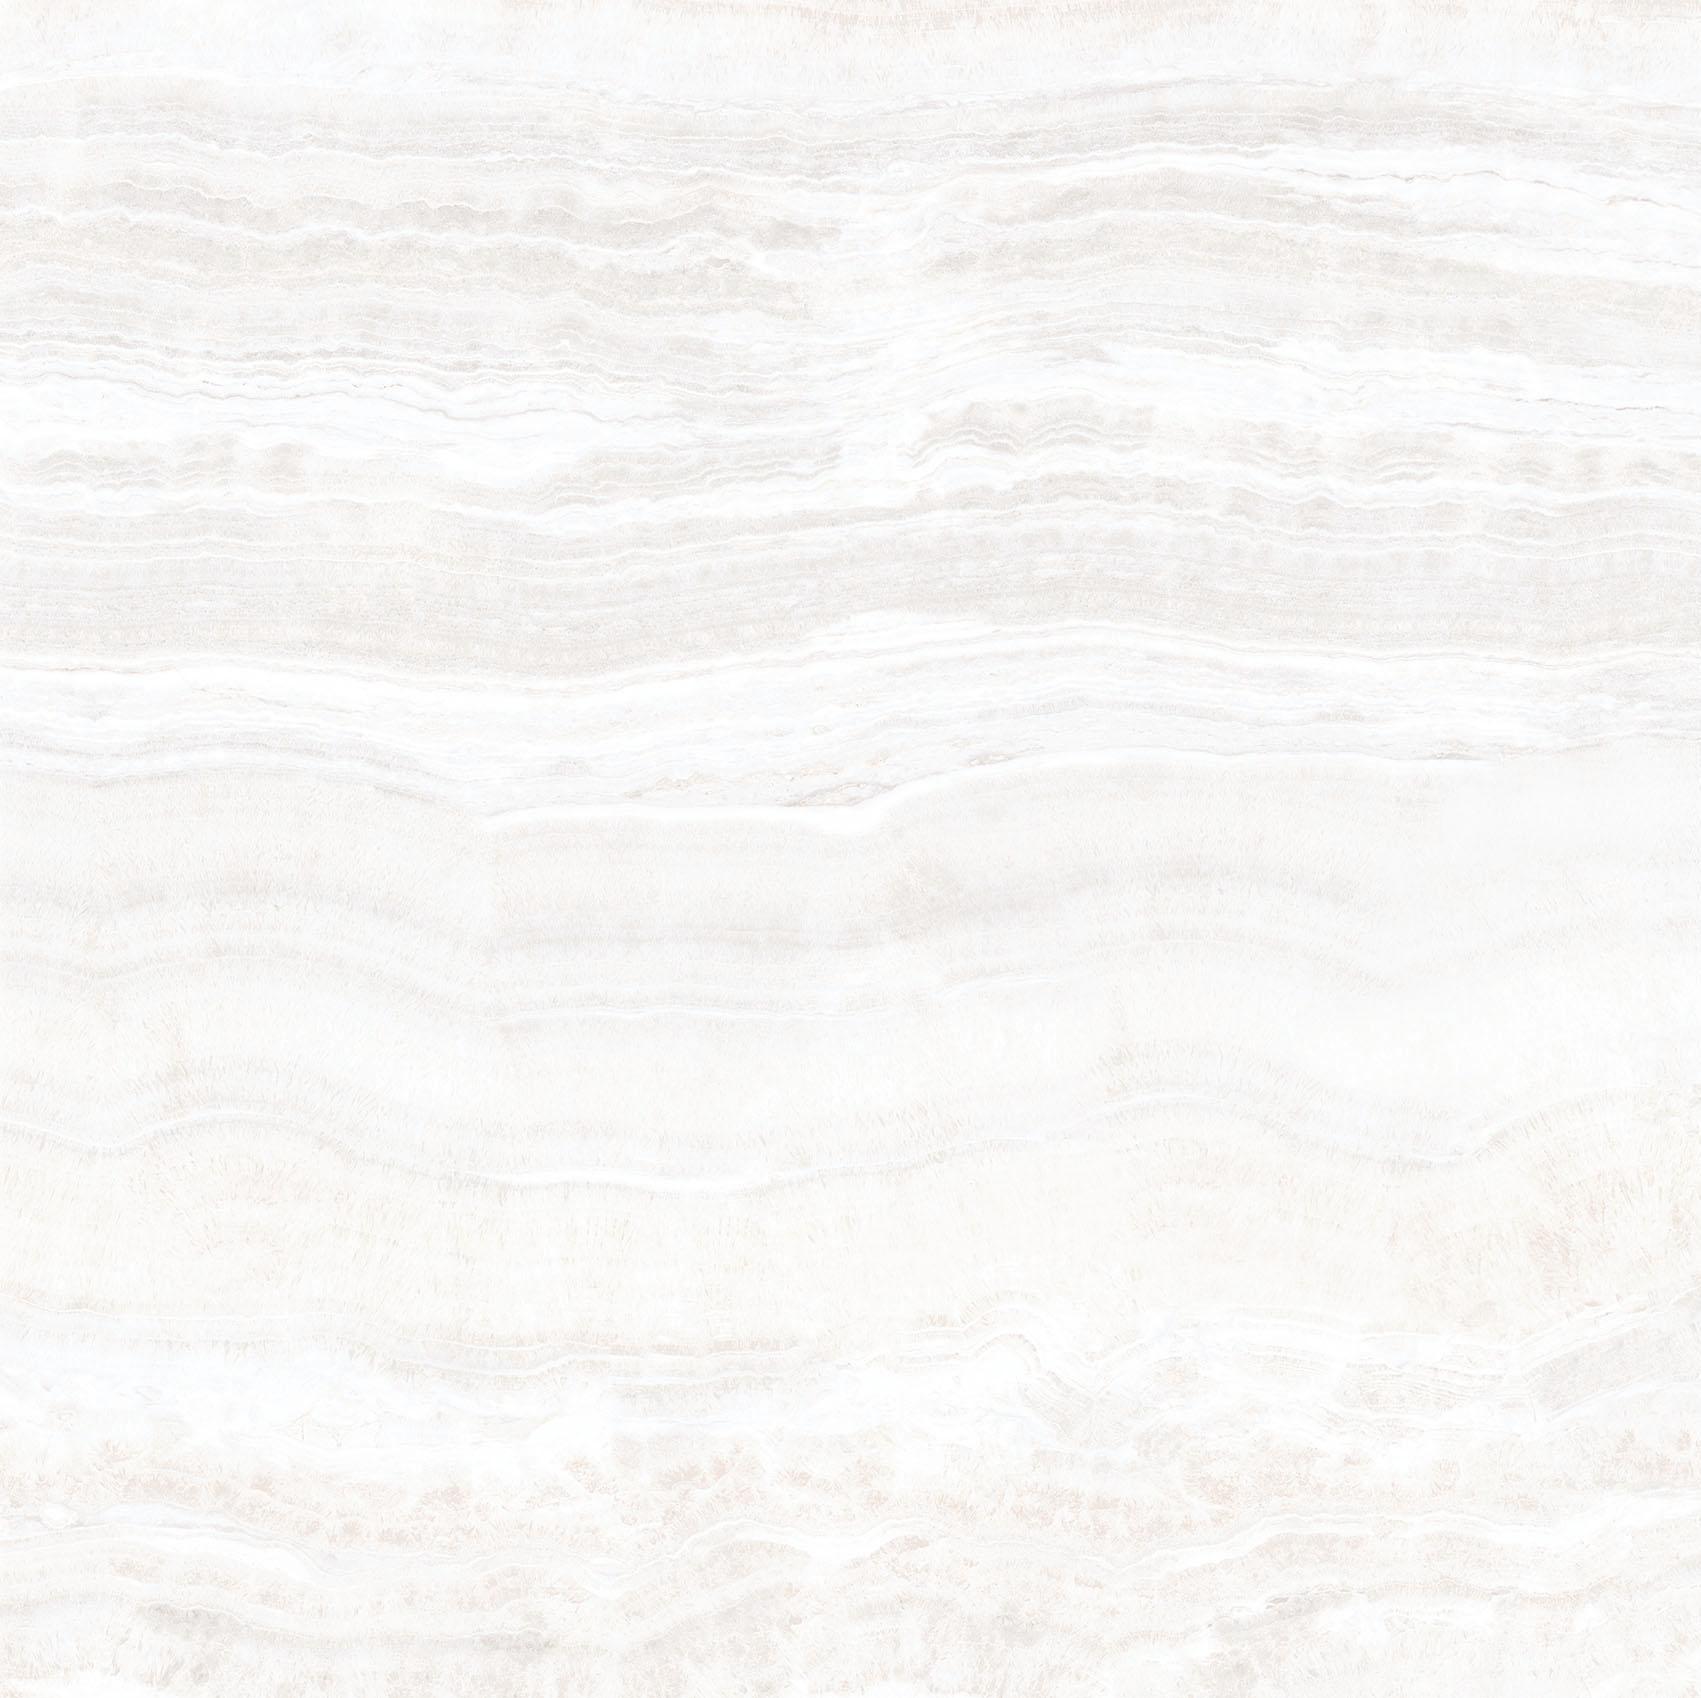 Onyx of Cerim White Matte 10mm 60 x 60